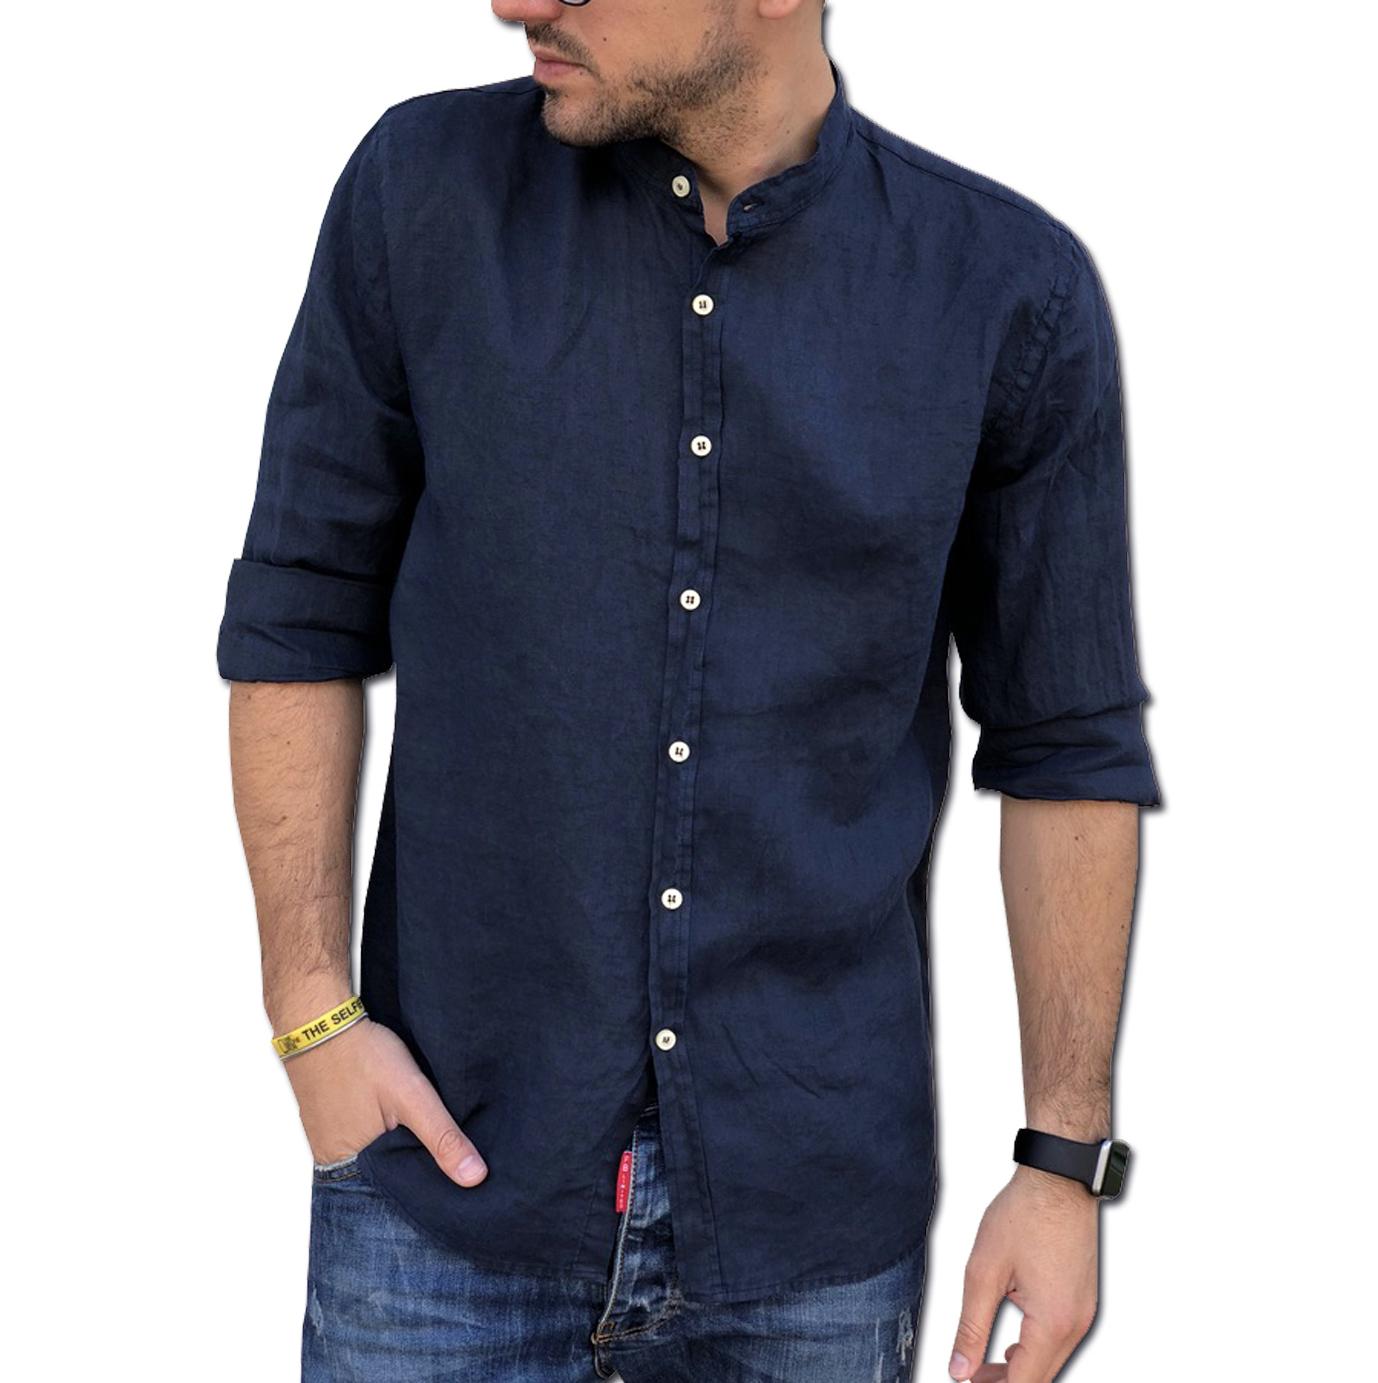 XL 3XL Uomo Button-Down Manica Lunga Art.20 CAMICIE /& dintorni Camicia Puro Lino TIPOS Made in Italy Tg L XXL M